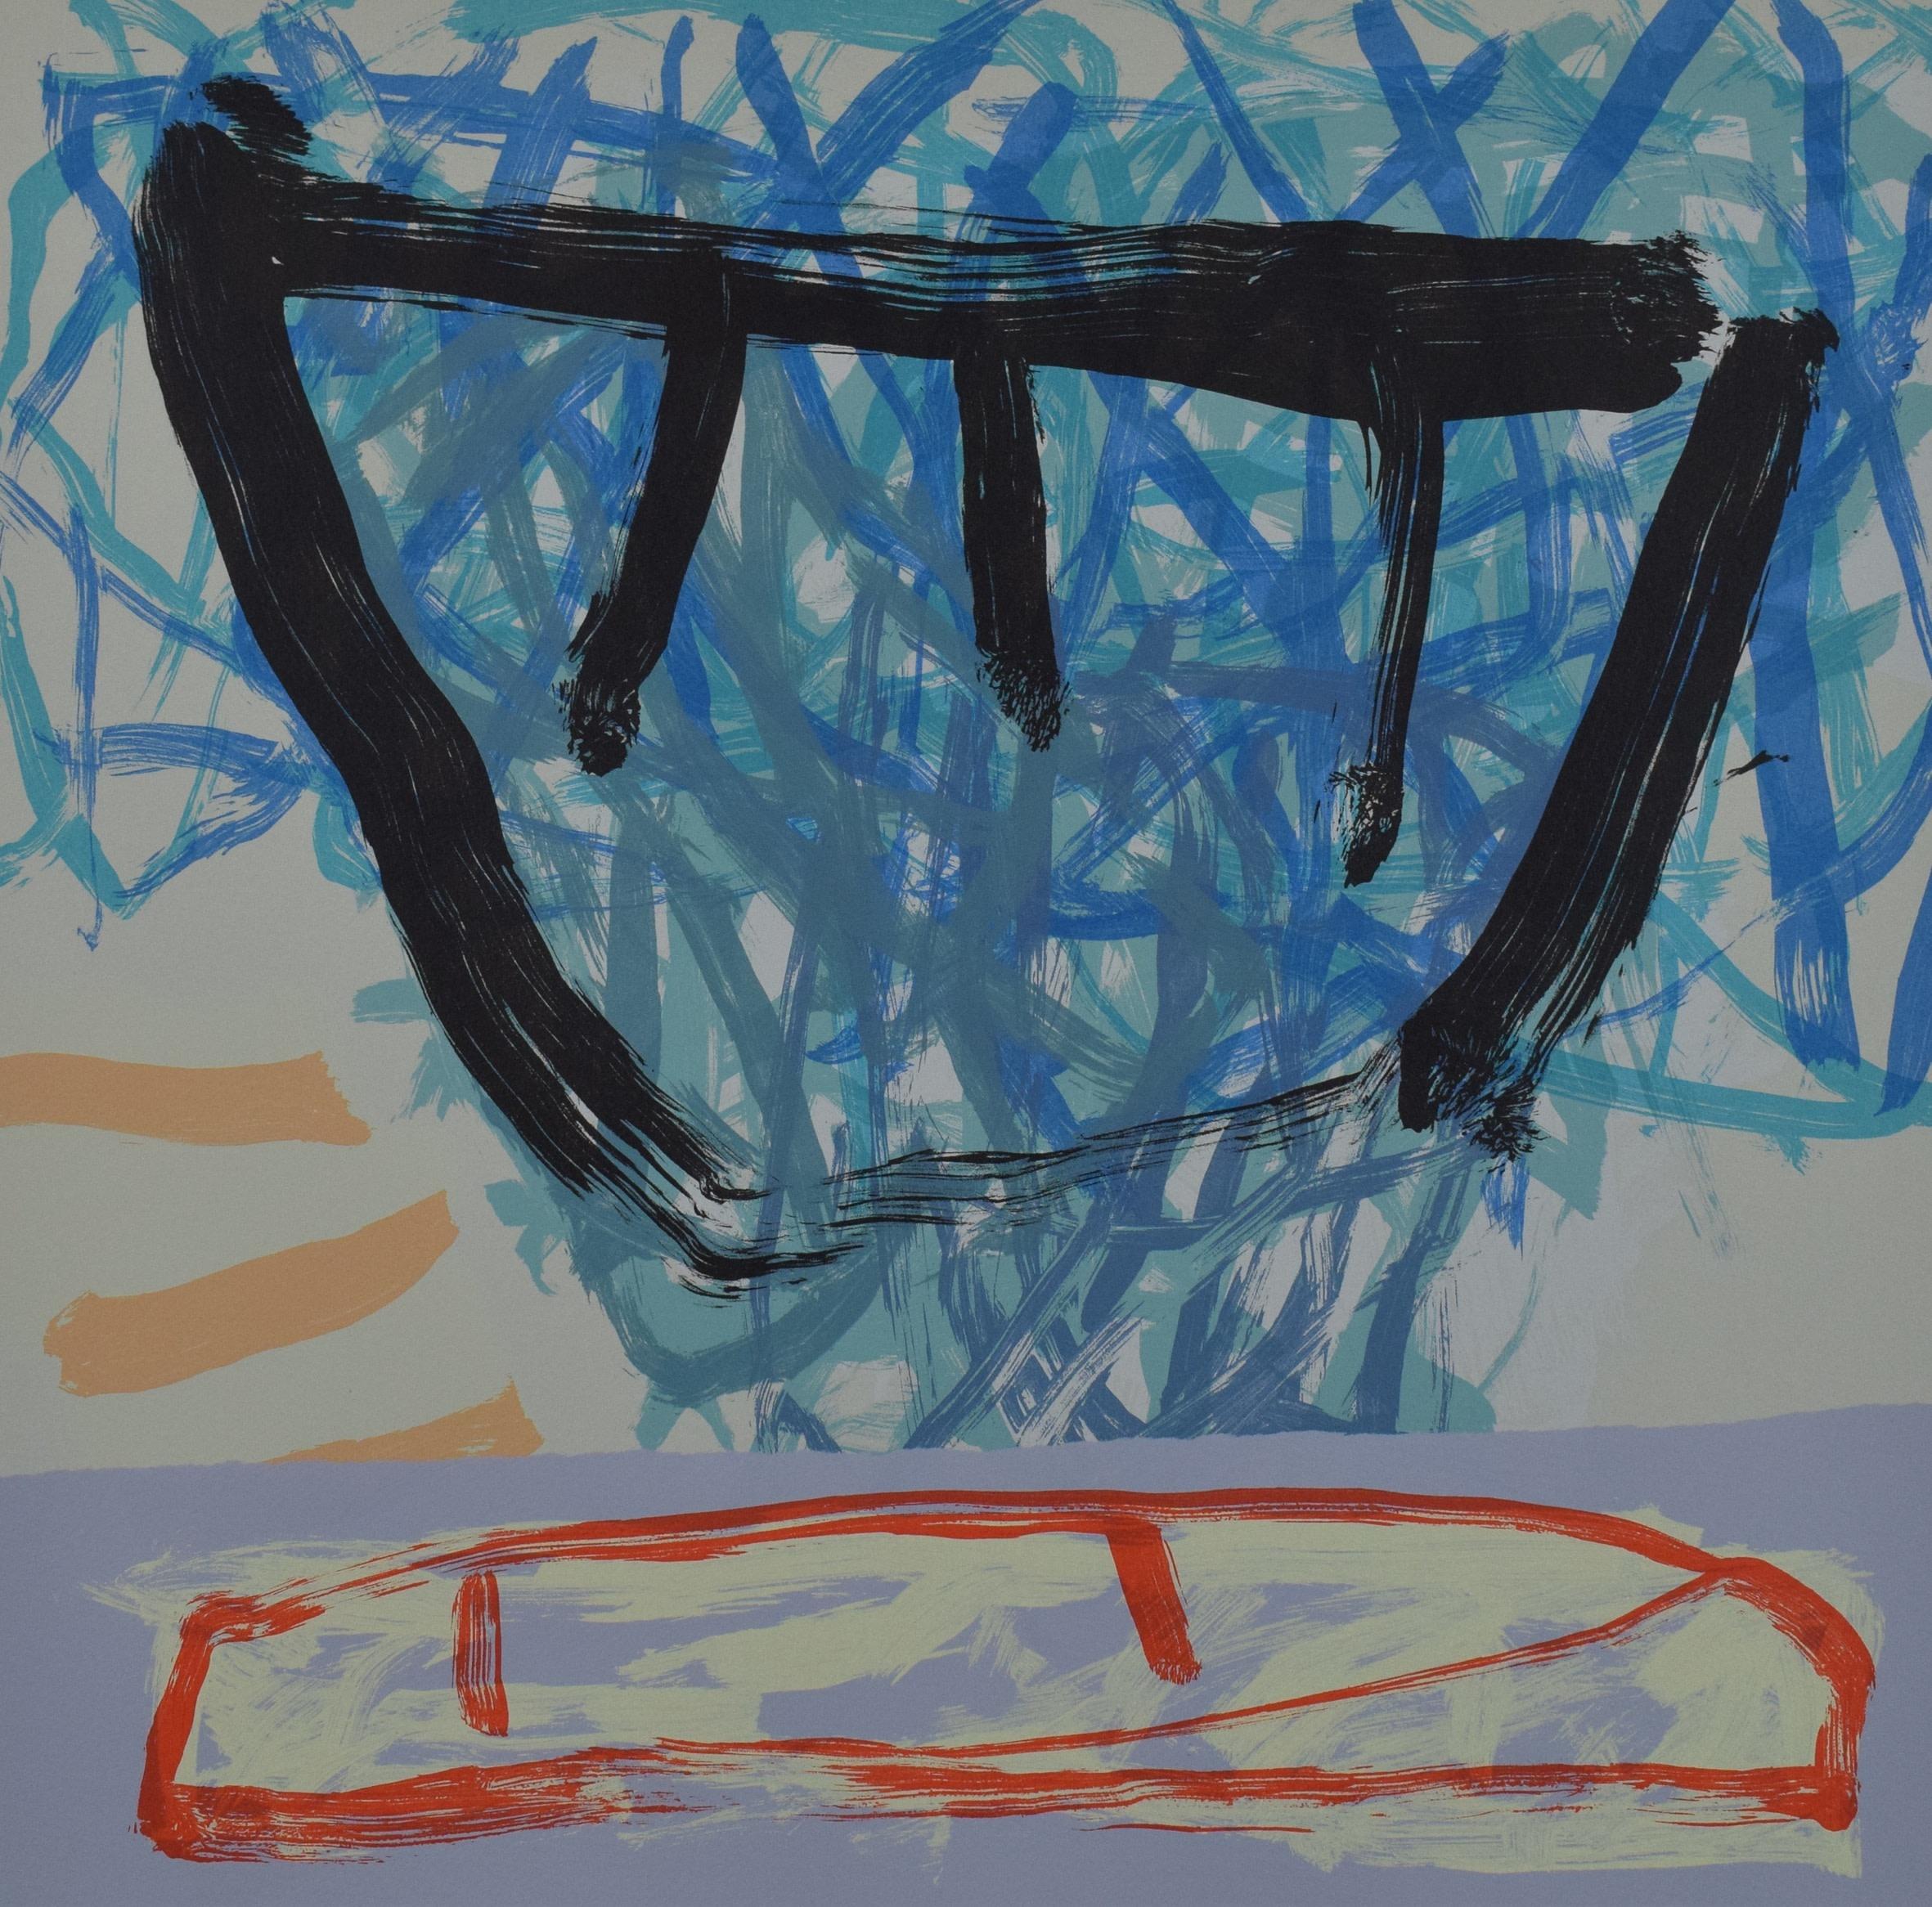 "<span class=""link fancybox-details-link""><a href=""/exhibitions/20/works/artworks_standalone10735/"">View Detail Page</a></span><div class=""artist""><span class=""artist""><strong>Michelle Griffiths VPRE</strong></span></div><div class=""title""><em>The Next Horizon</em></div><div class=""medium"">screenprint</div><div class=""dimensions"">40 x 40 cm image size</div><div class=""edition_details"">edition of 8</div>"